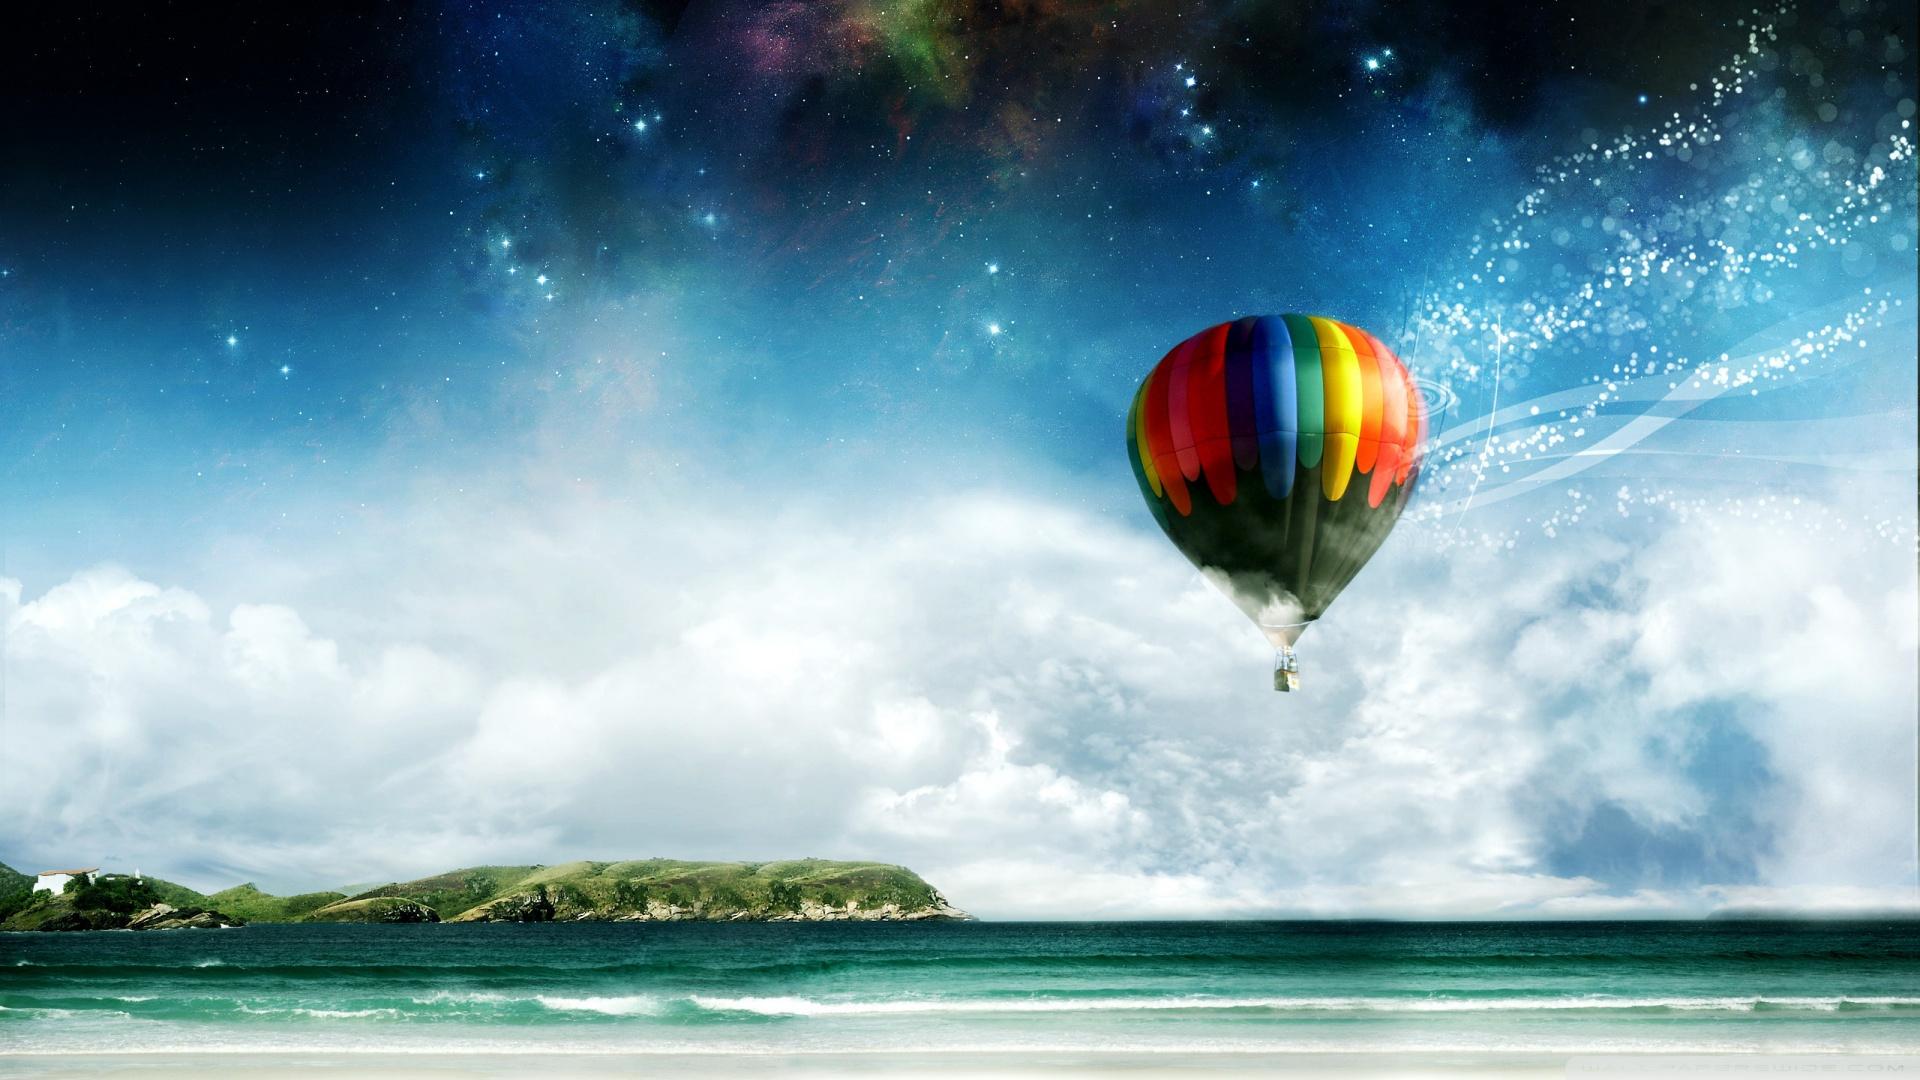 Colorful Hot Air Balloon Ride Wallpaper 1920x1080 Colorful Hot Air 1920x1080